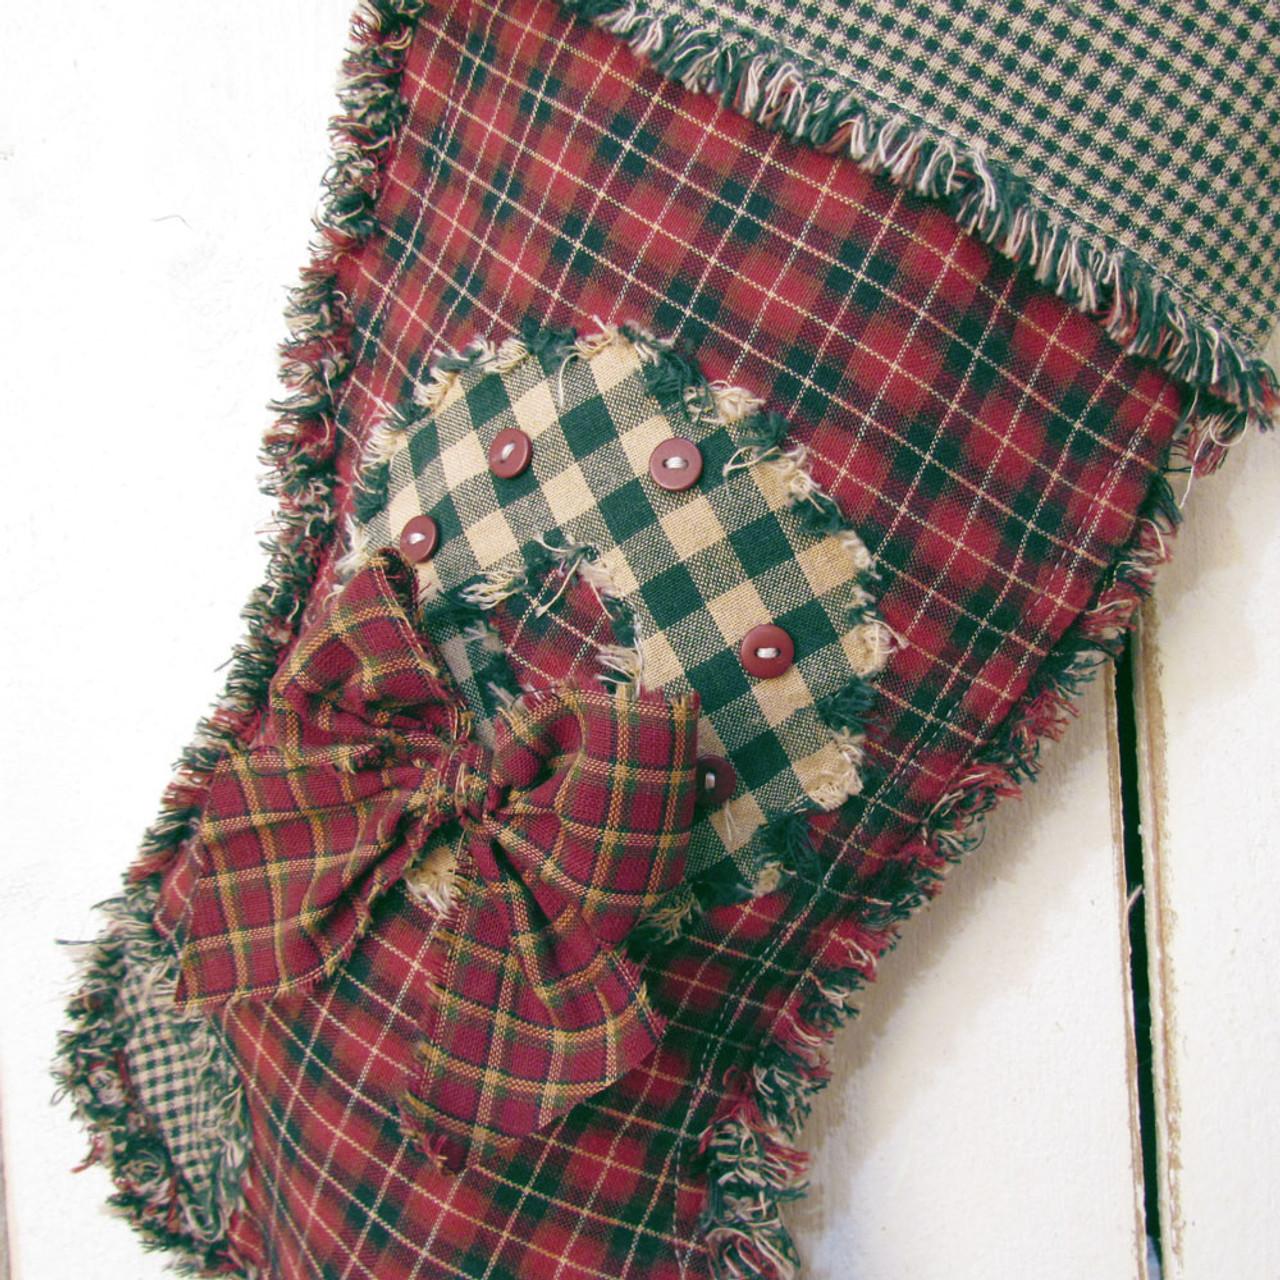 Ragged Christmas Stocking Pattern - DIGITAL